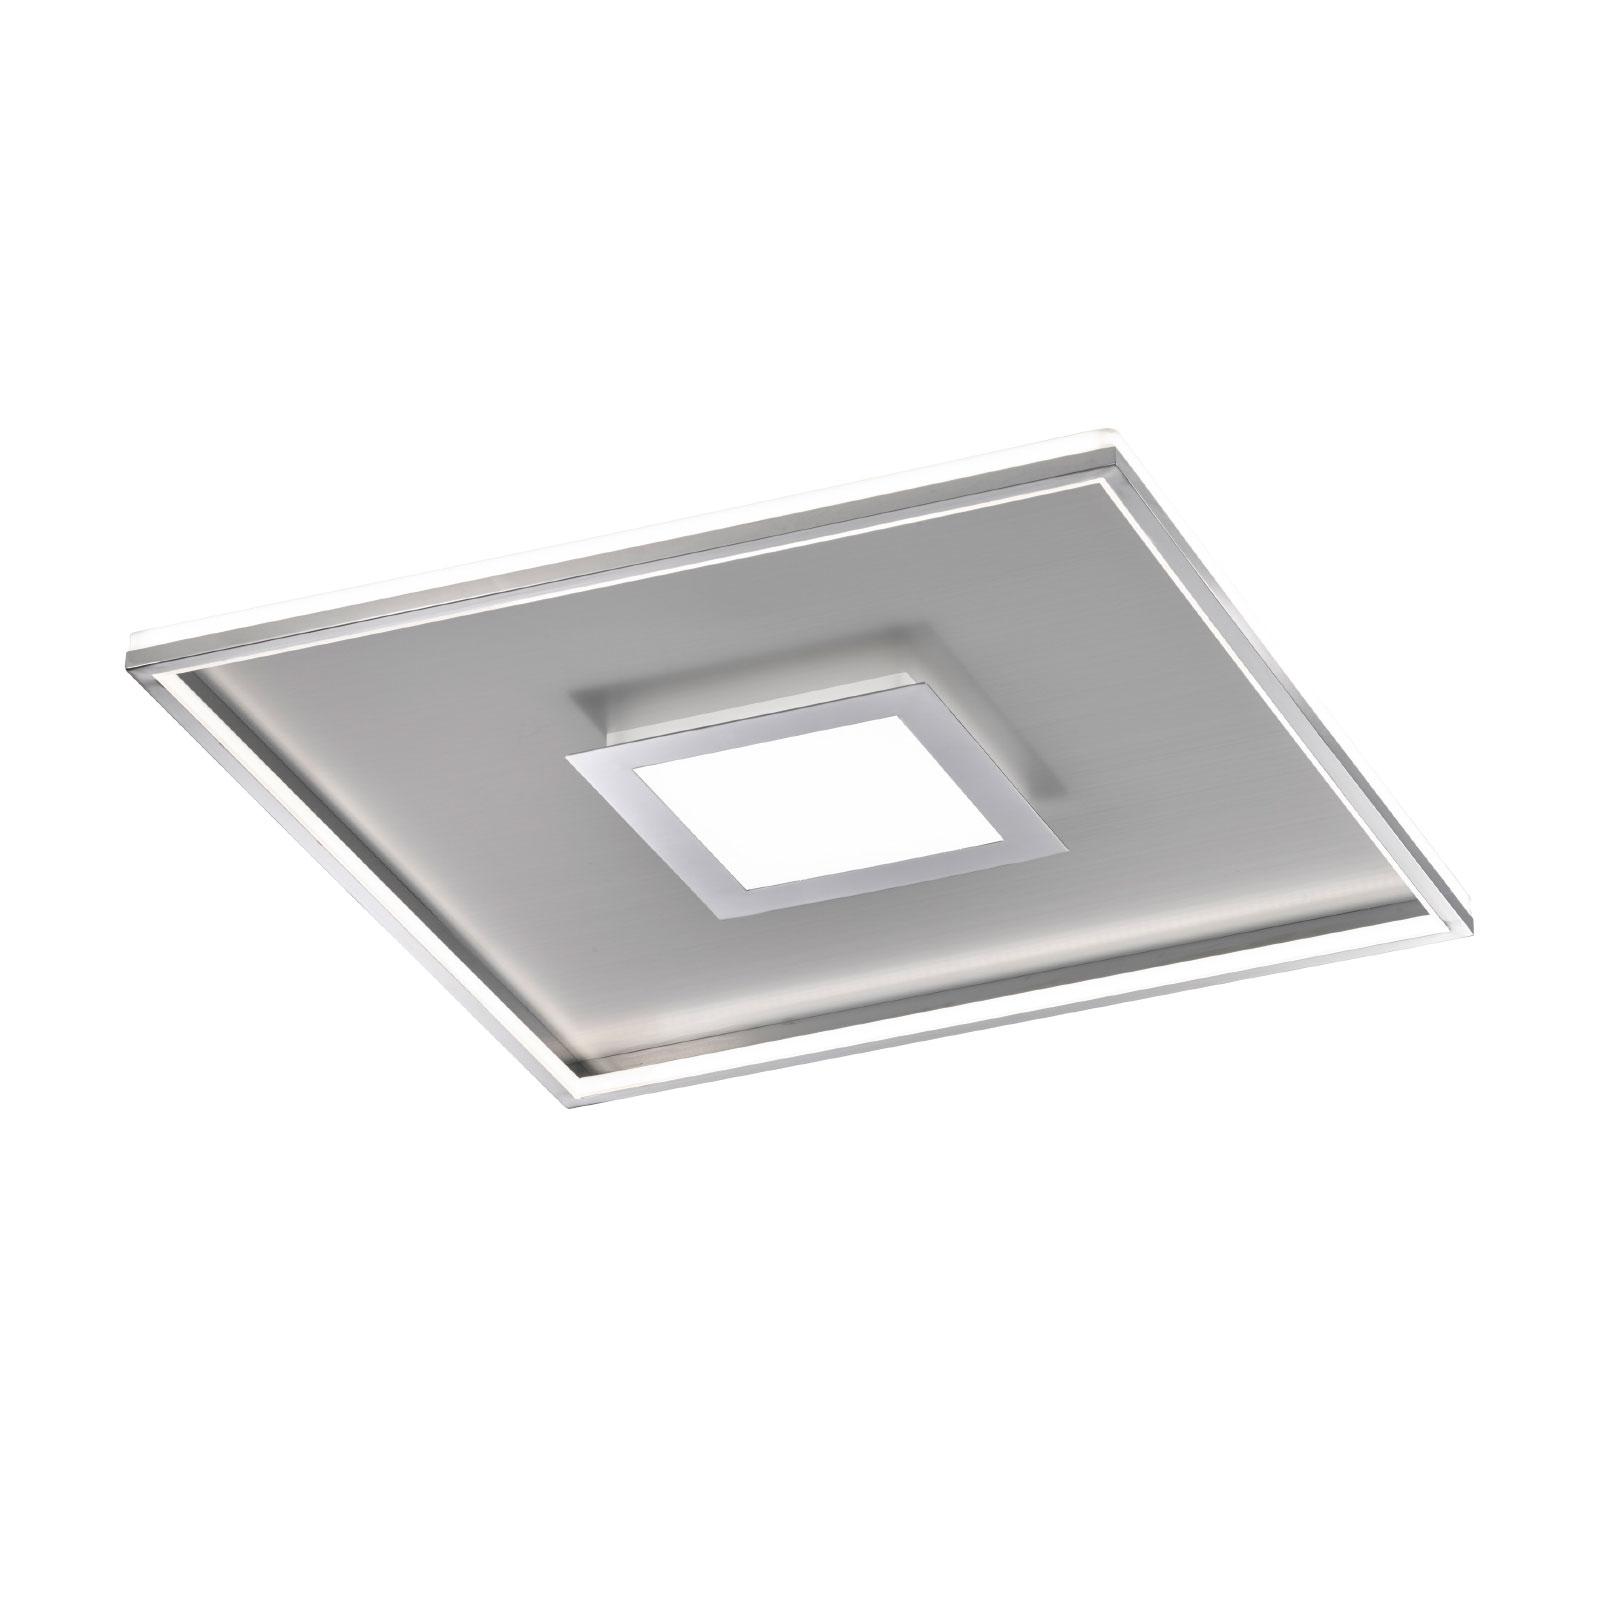 LED-taklampe Zoe, kvadrat, krom, 60x60 cm